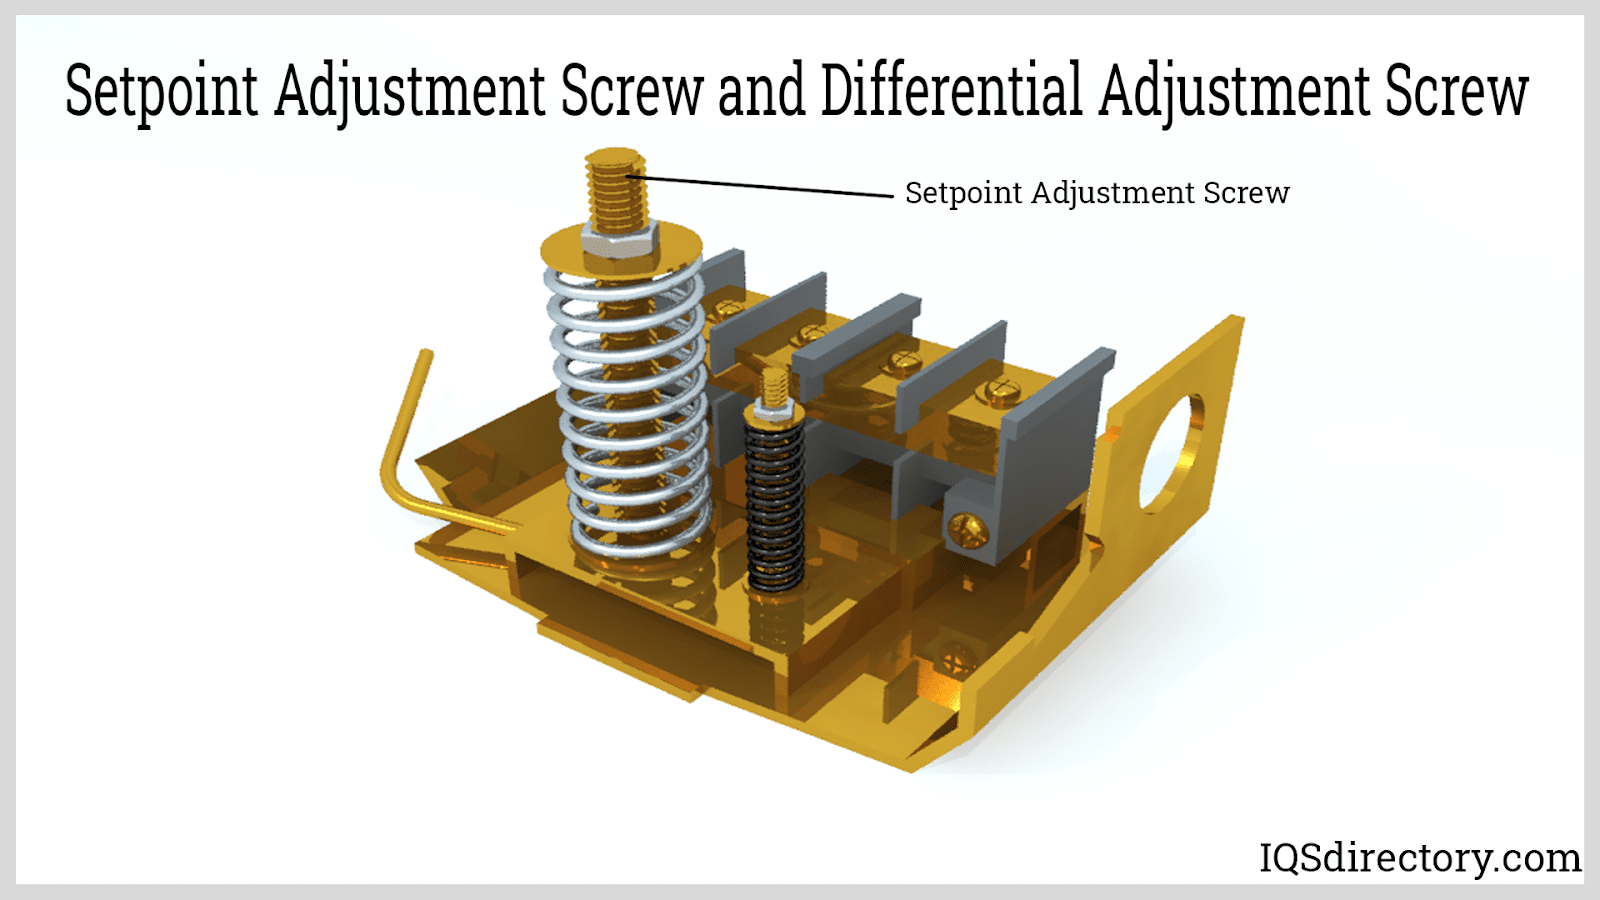 Setpoint Adjustment Screw and Differential Adjustment Screw